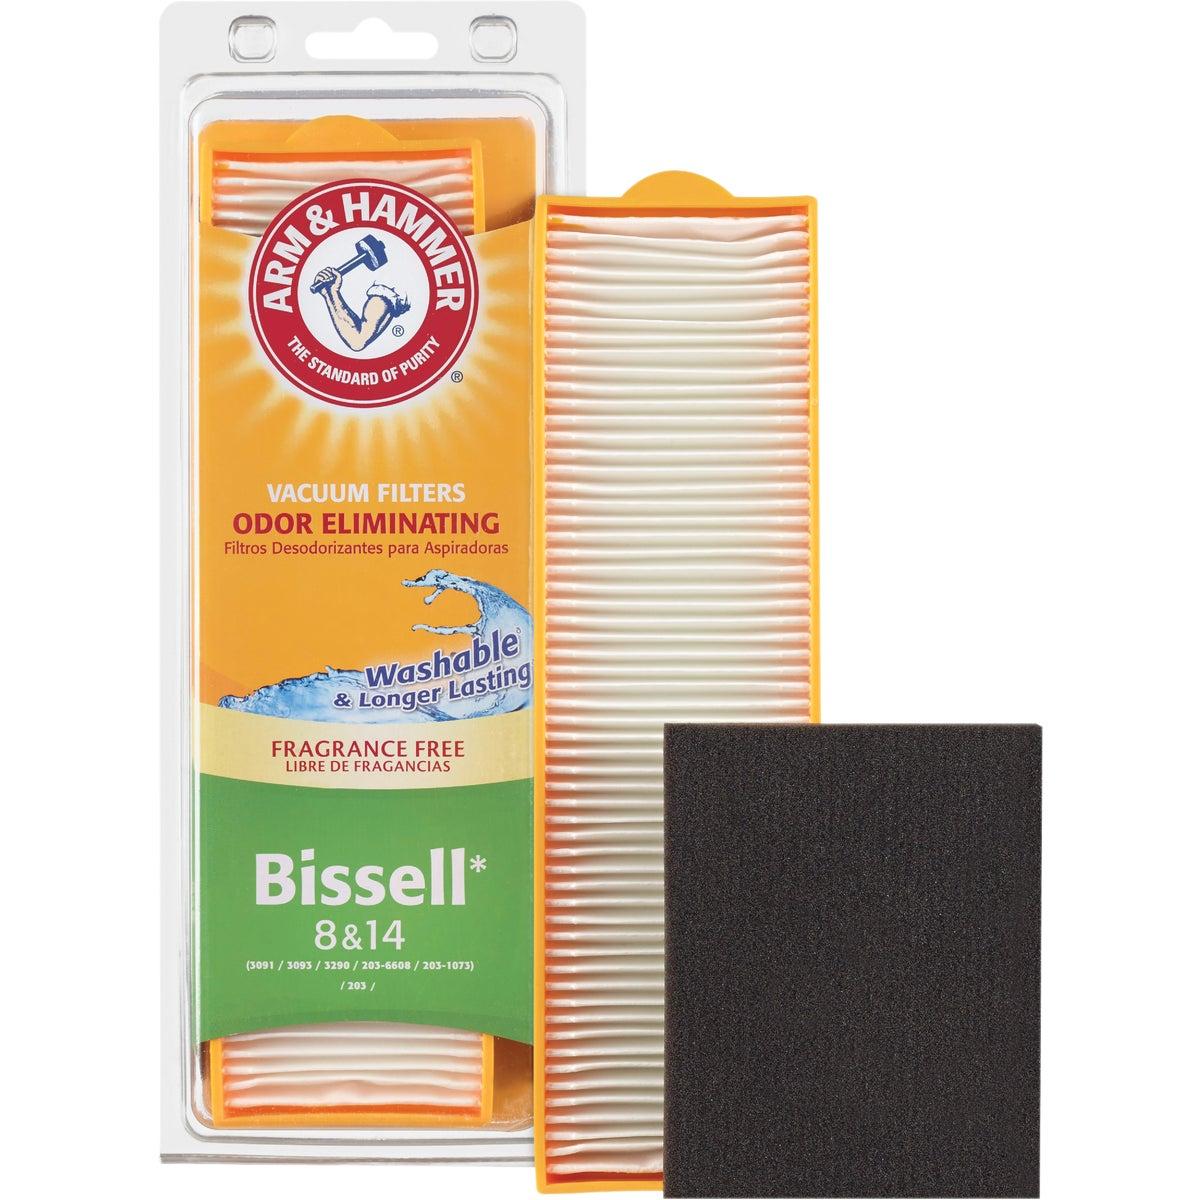 3M Filtrete Bissell 8/14 Vacuum Filter